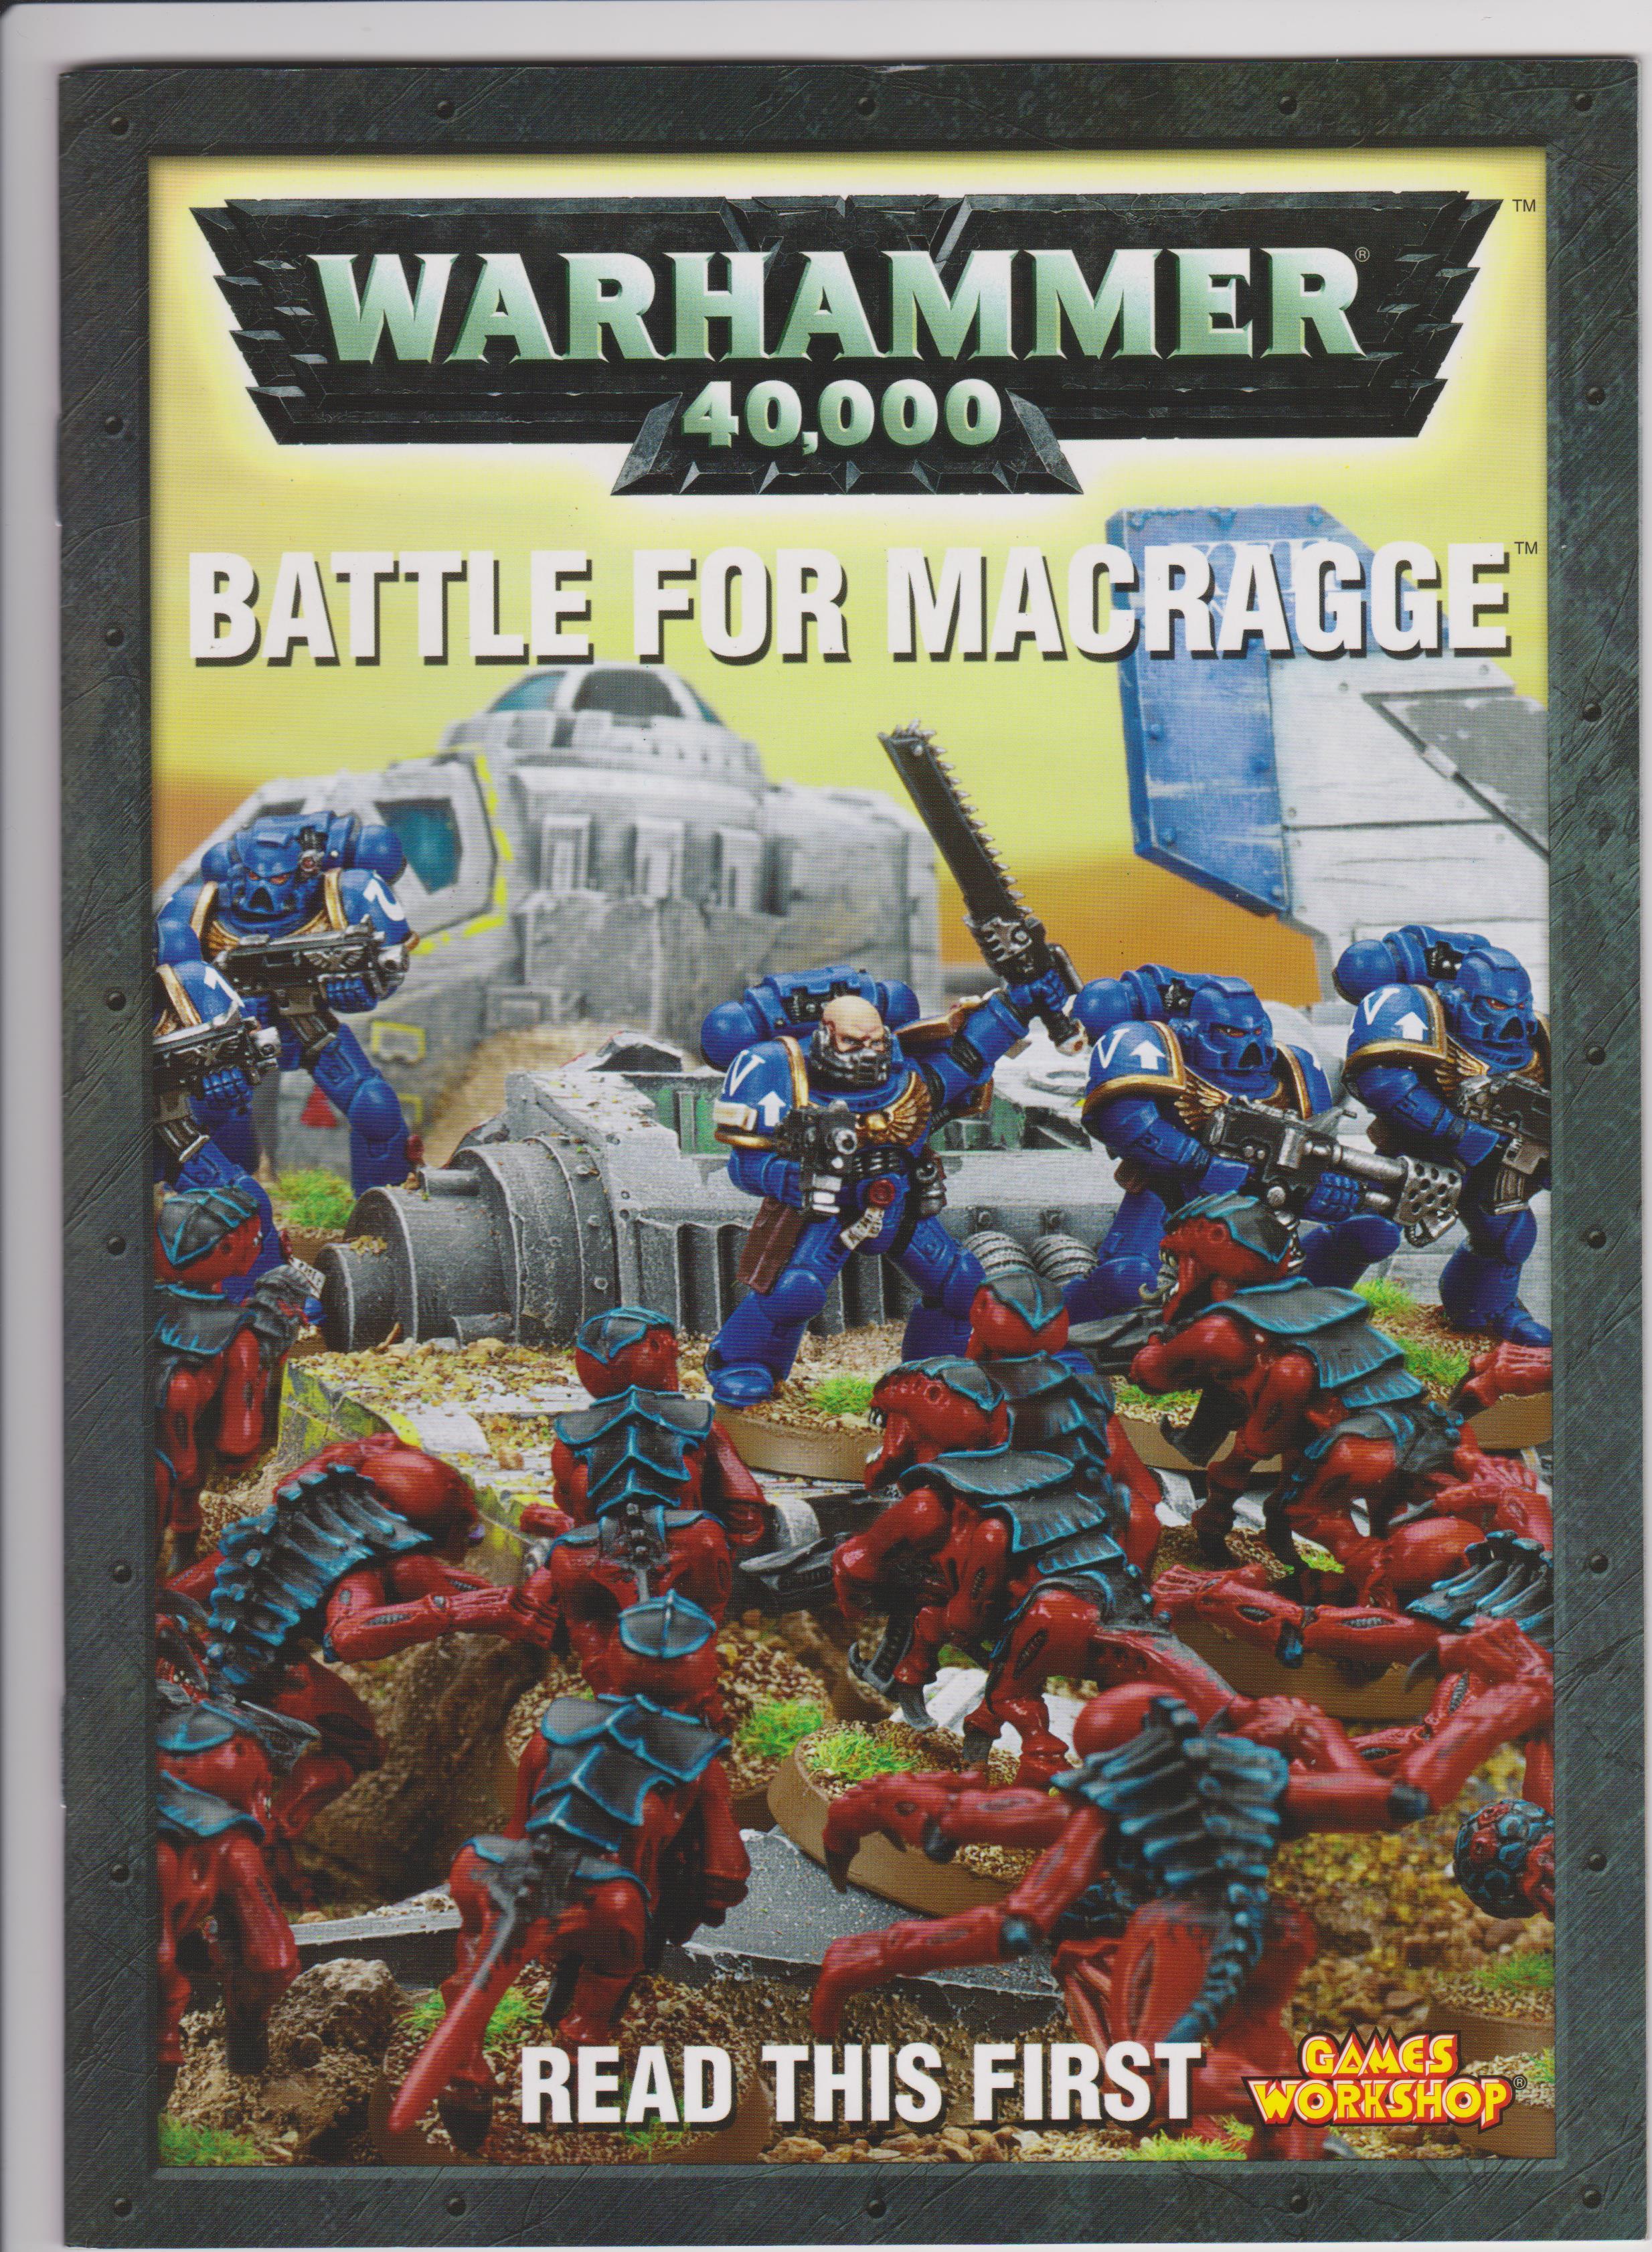 Book, Macragge, Ultramarines